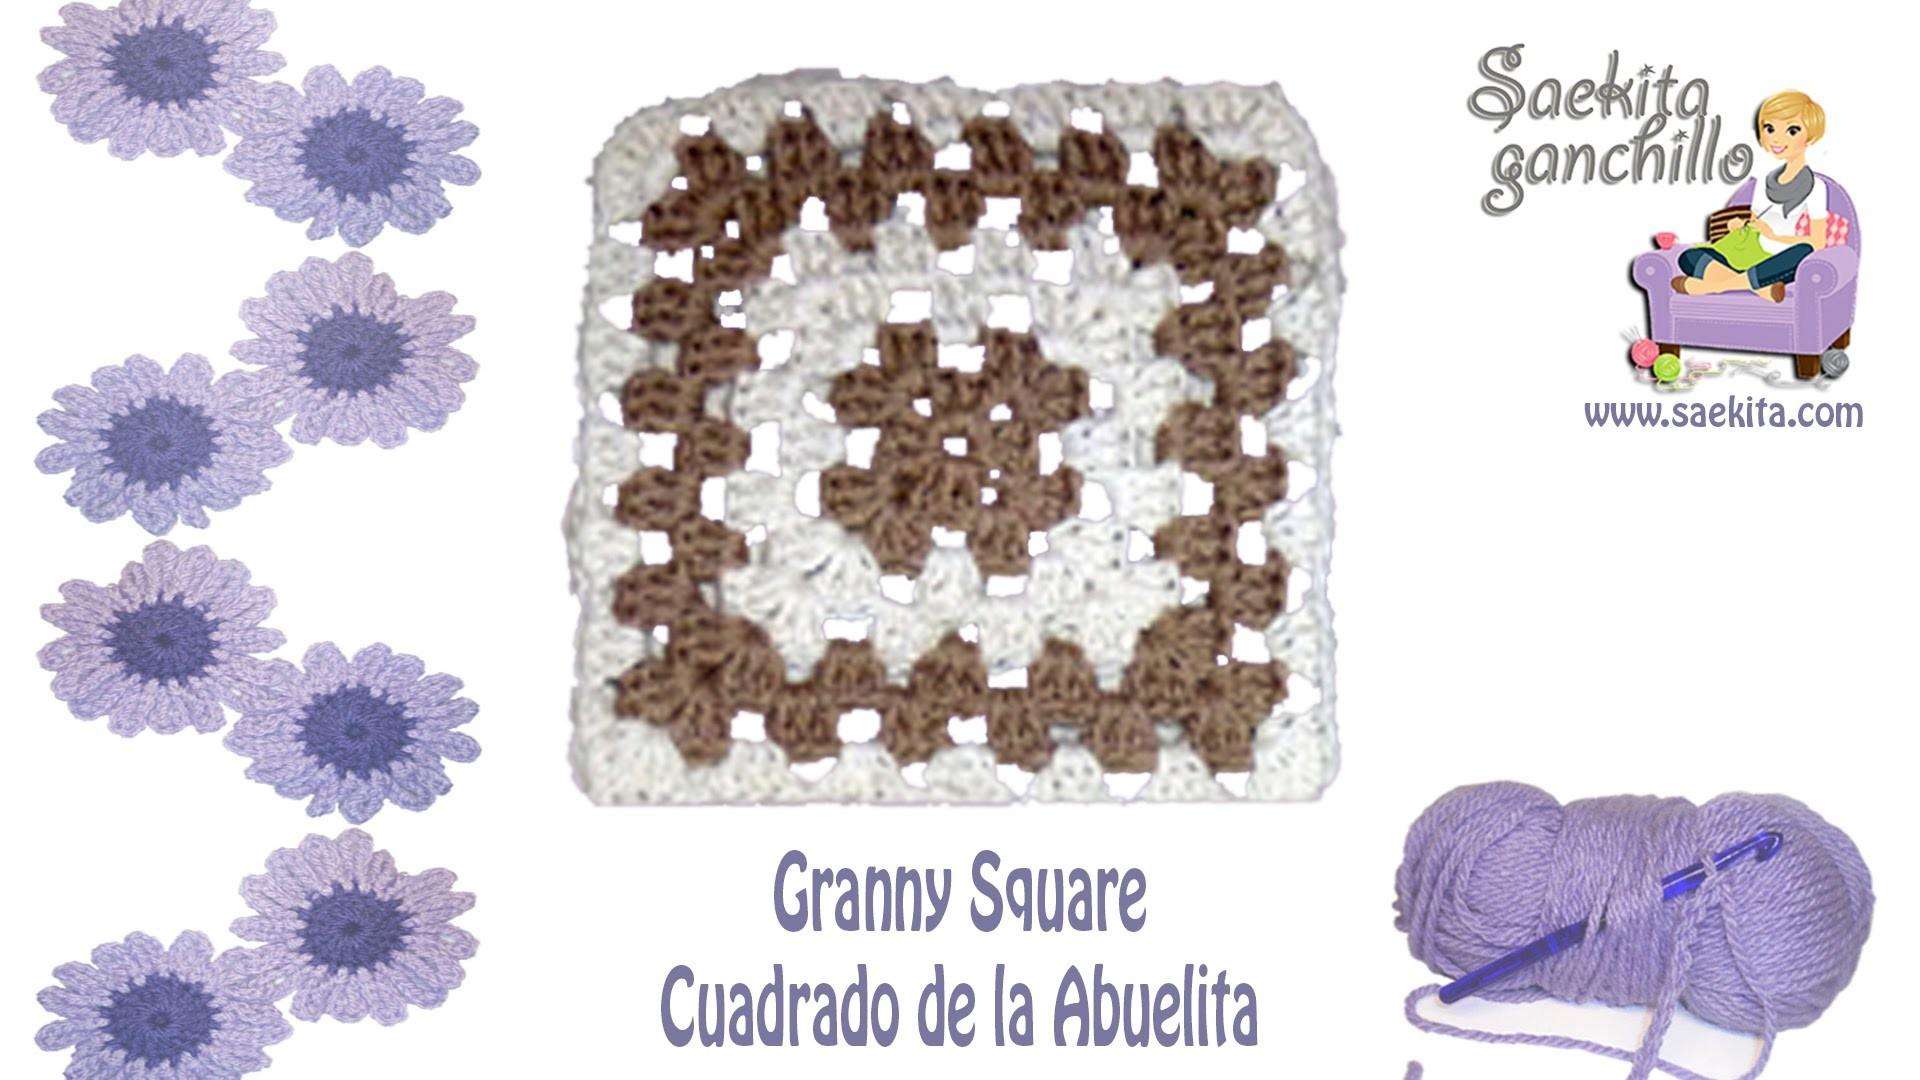 Cuadrado de la Abuelita (Granny Square) con cambio de color * Saekita Ganchillo